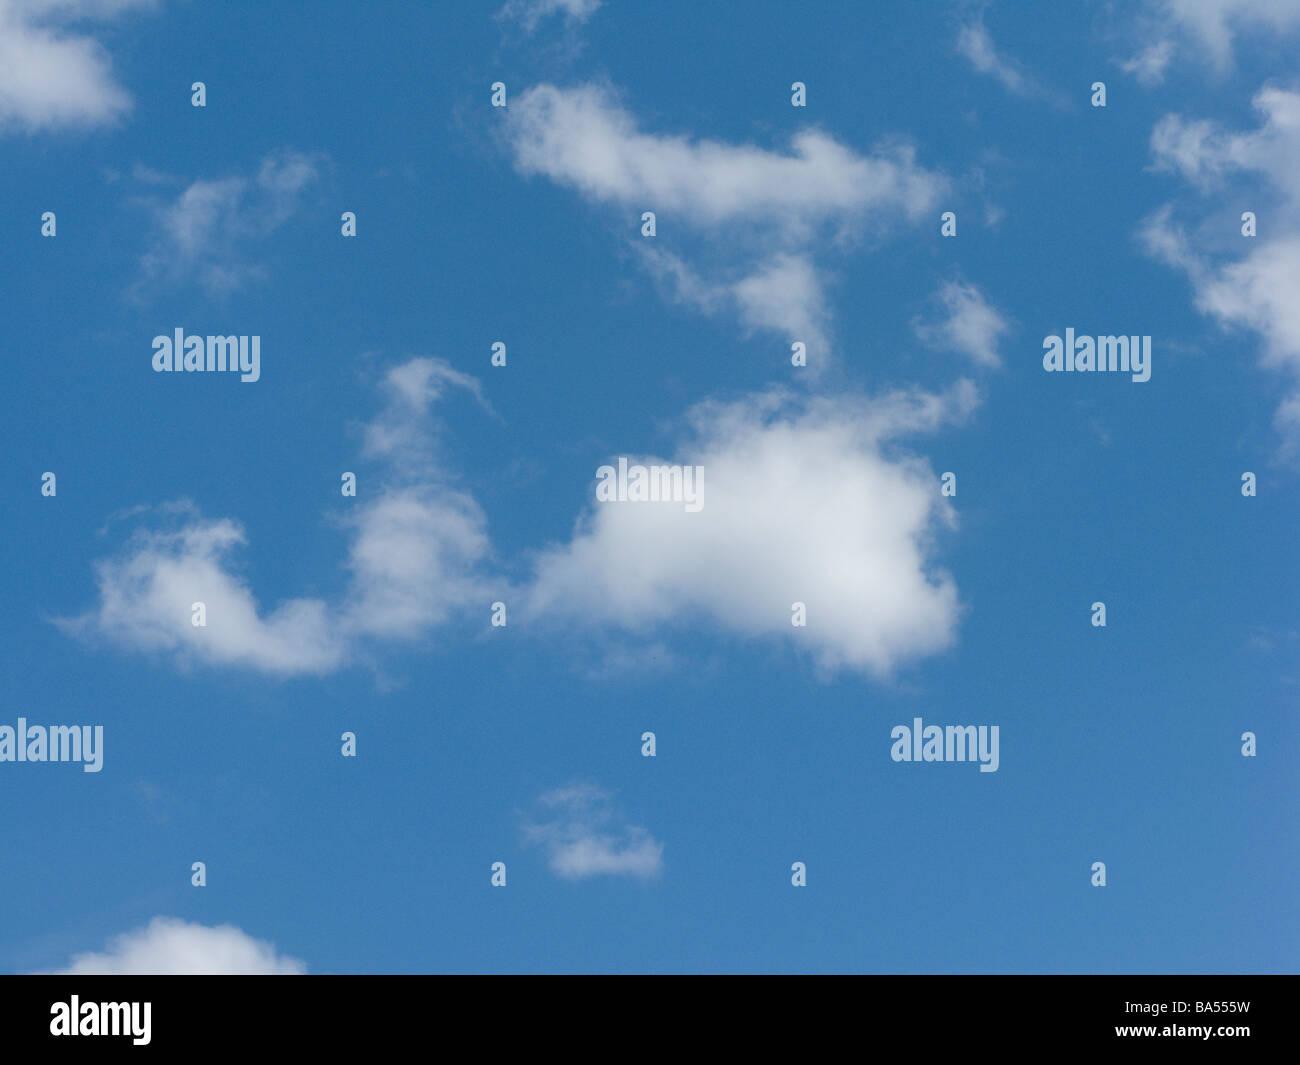 Cumulus Clouds in a Deep Blue Sky - Stock Image